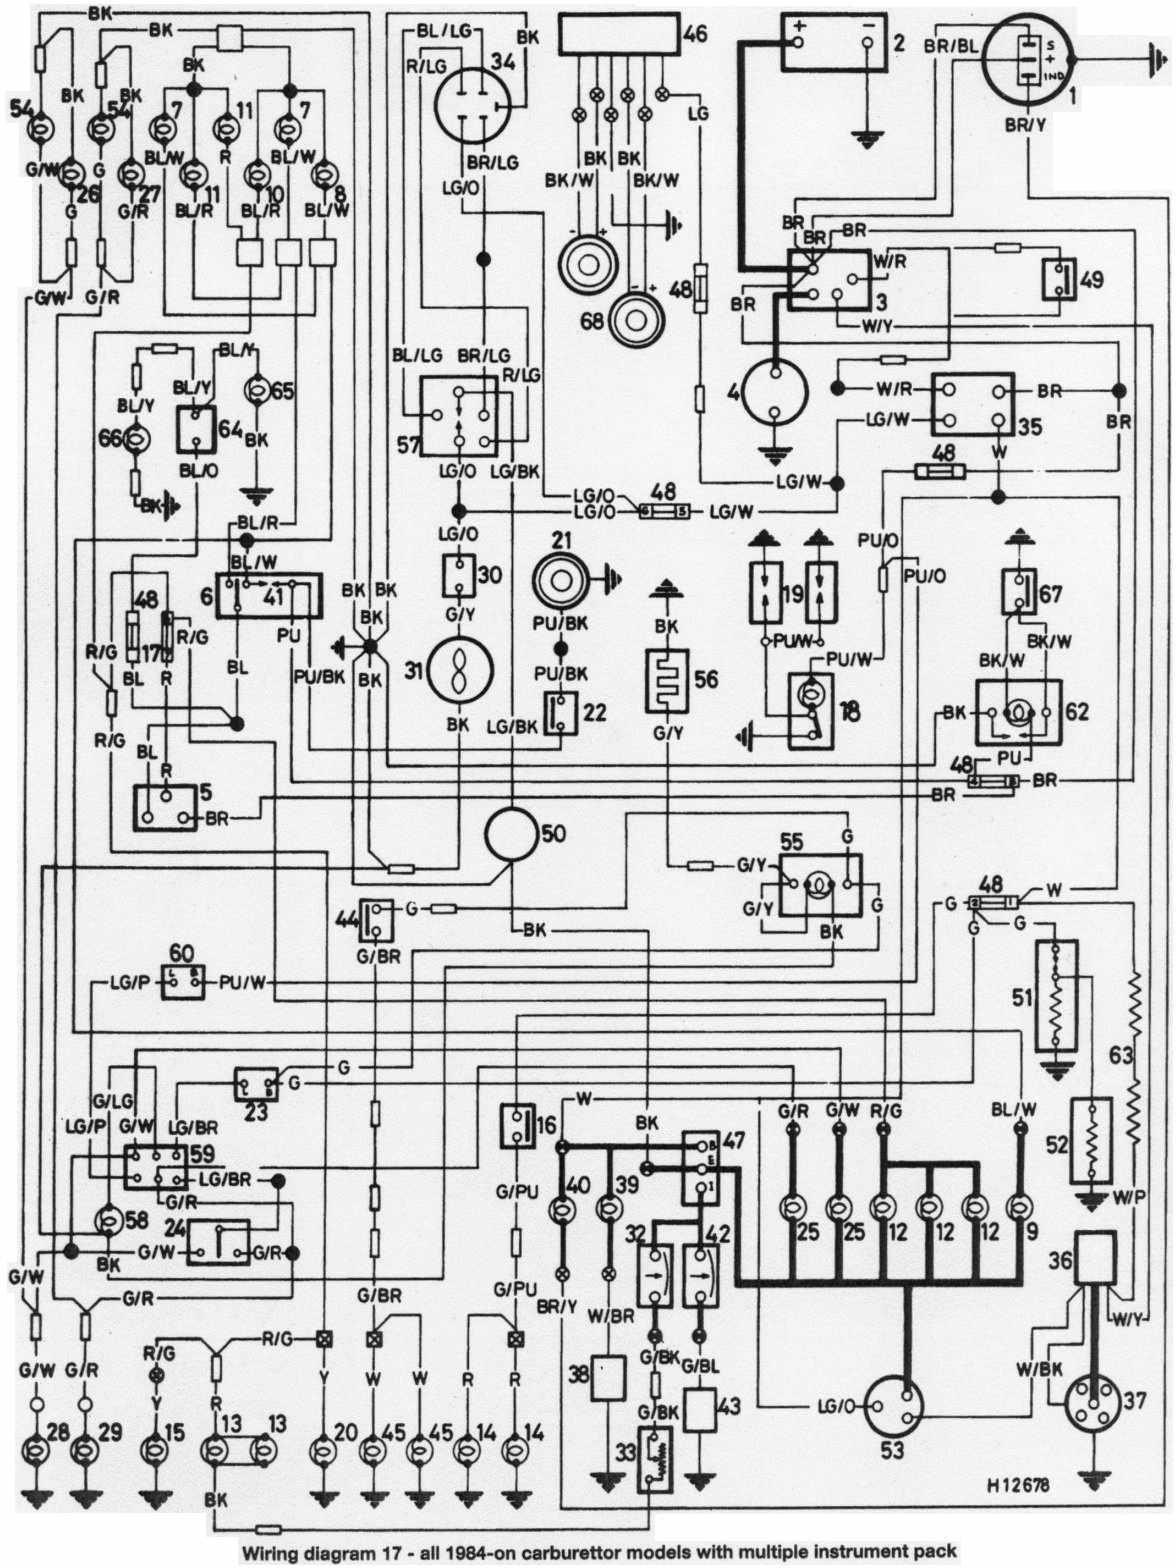 wiring diagram of 1984 onwards all mini series with multiple instrument pack?t\\\\\\\=1494187160 1999 winnebago adventurer wiring diagram 1999 winnebago adventurer 1999 winnebago adventurer wiring diagram at bayanpartner.co